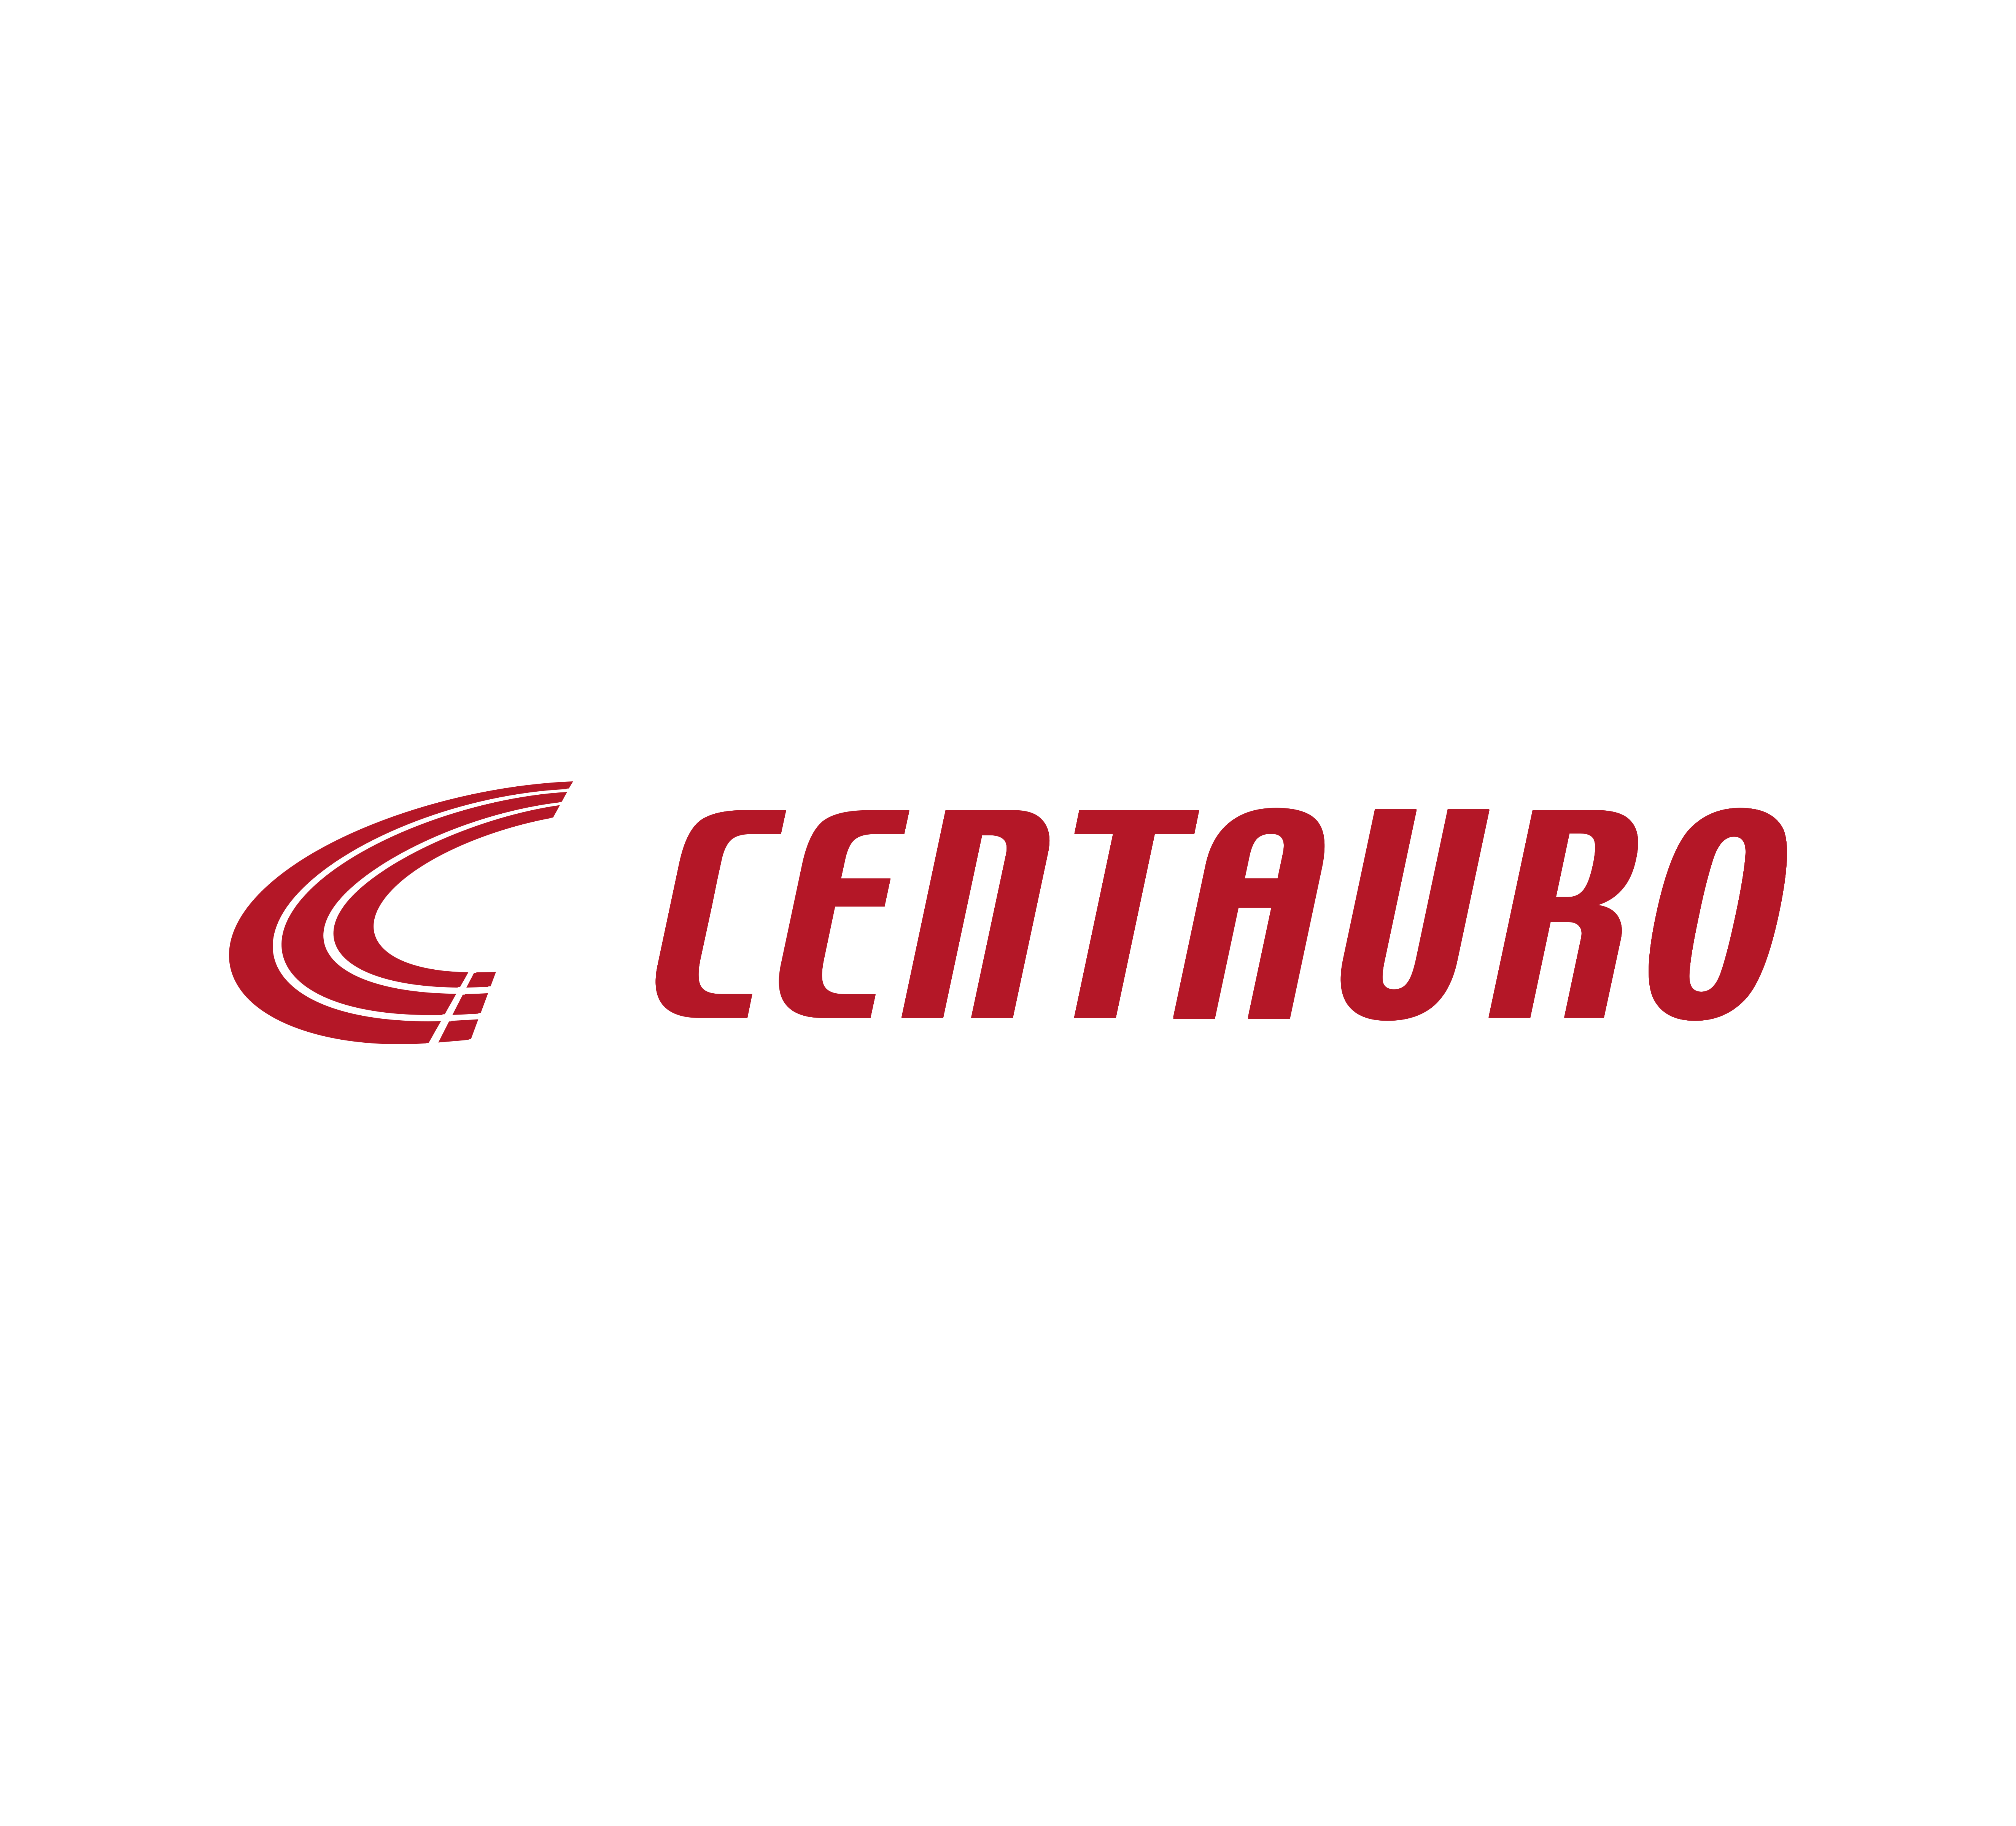 Logo Centauro